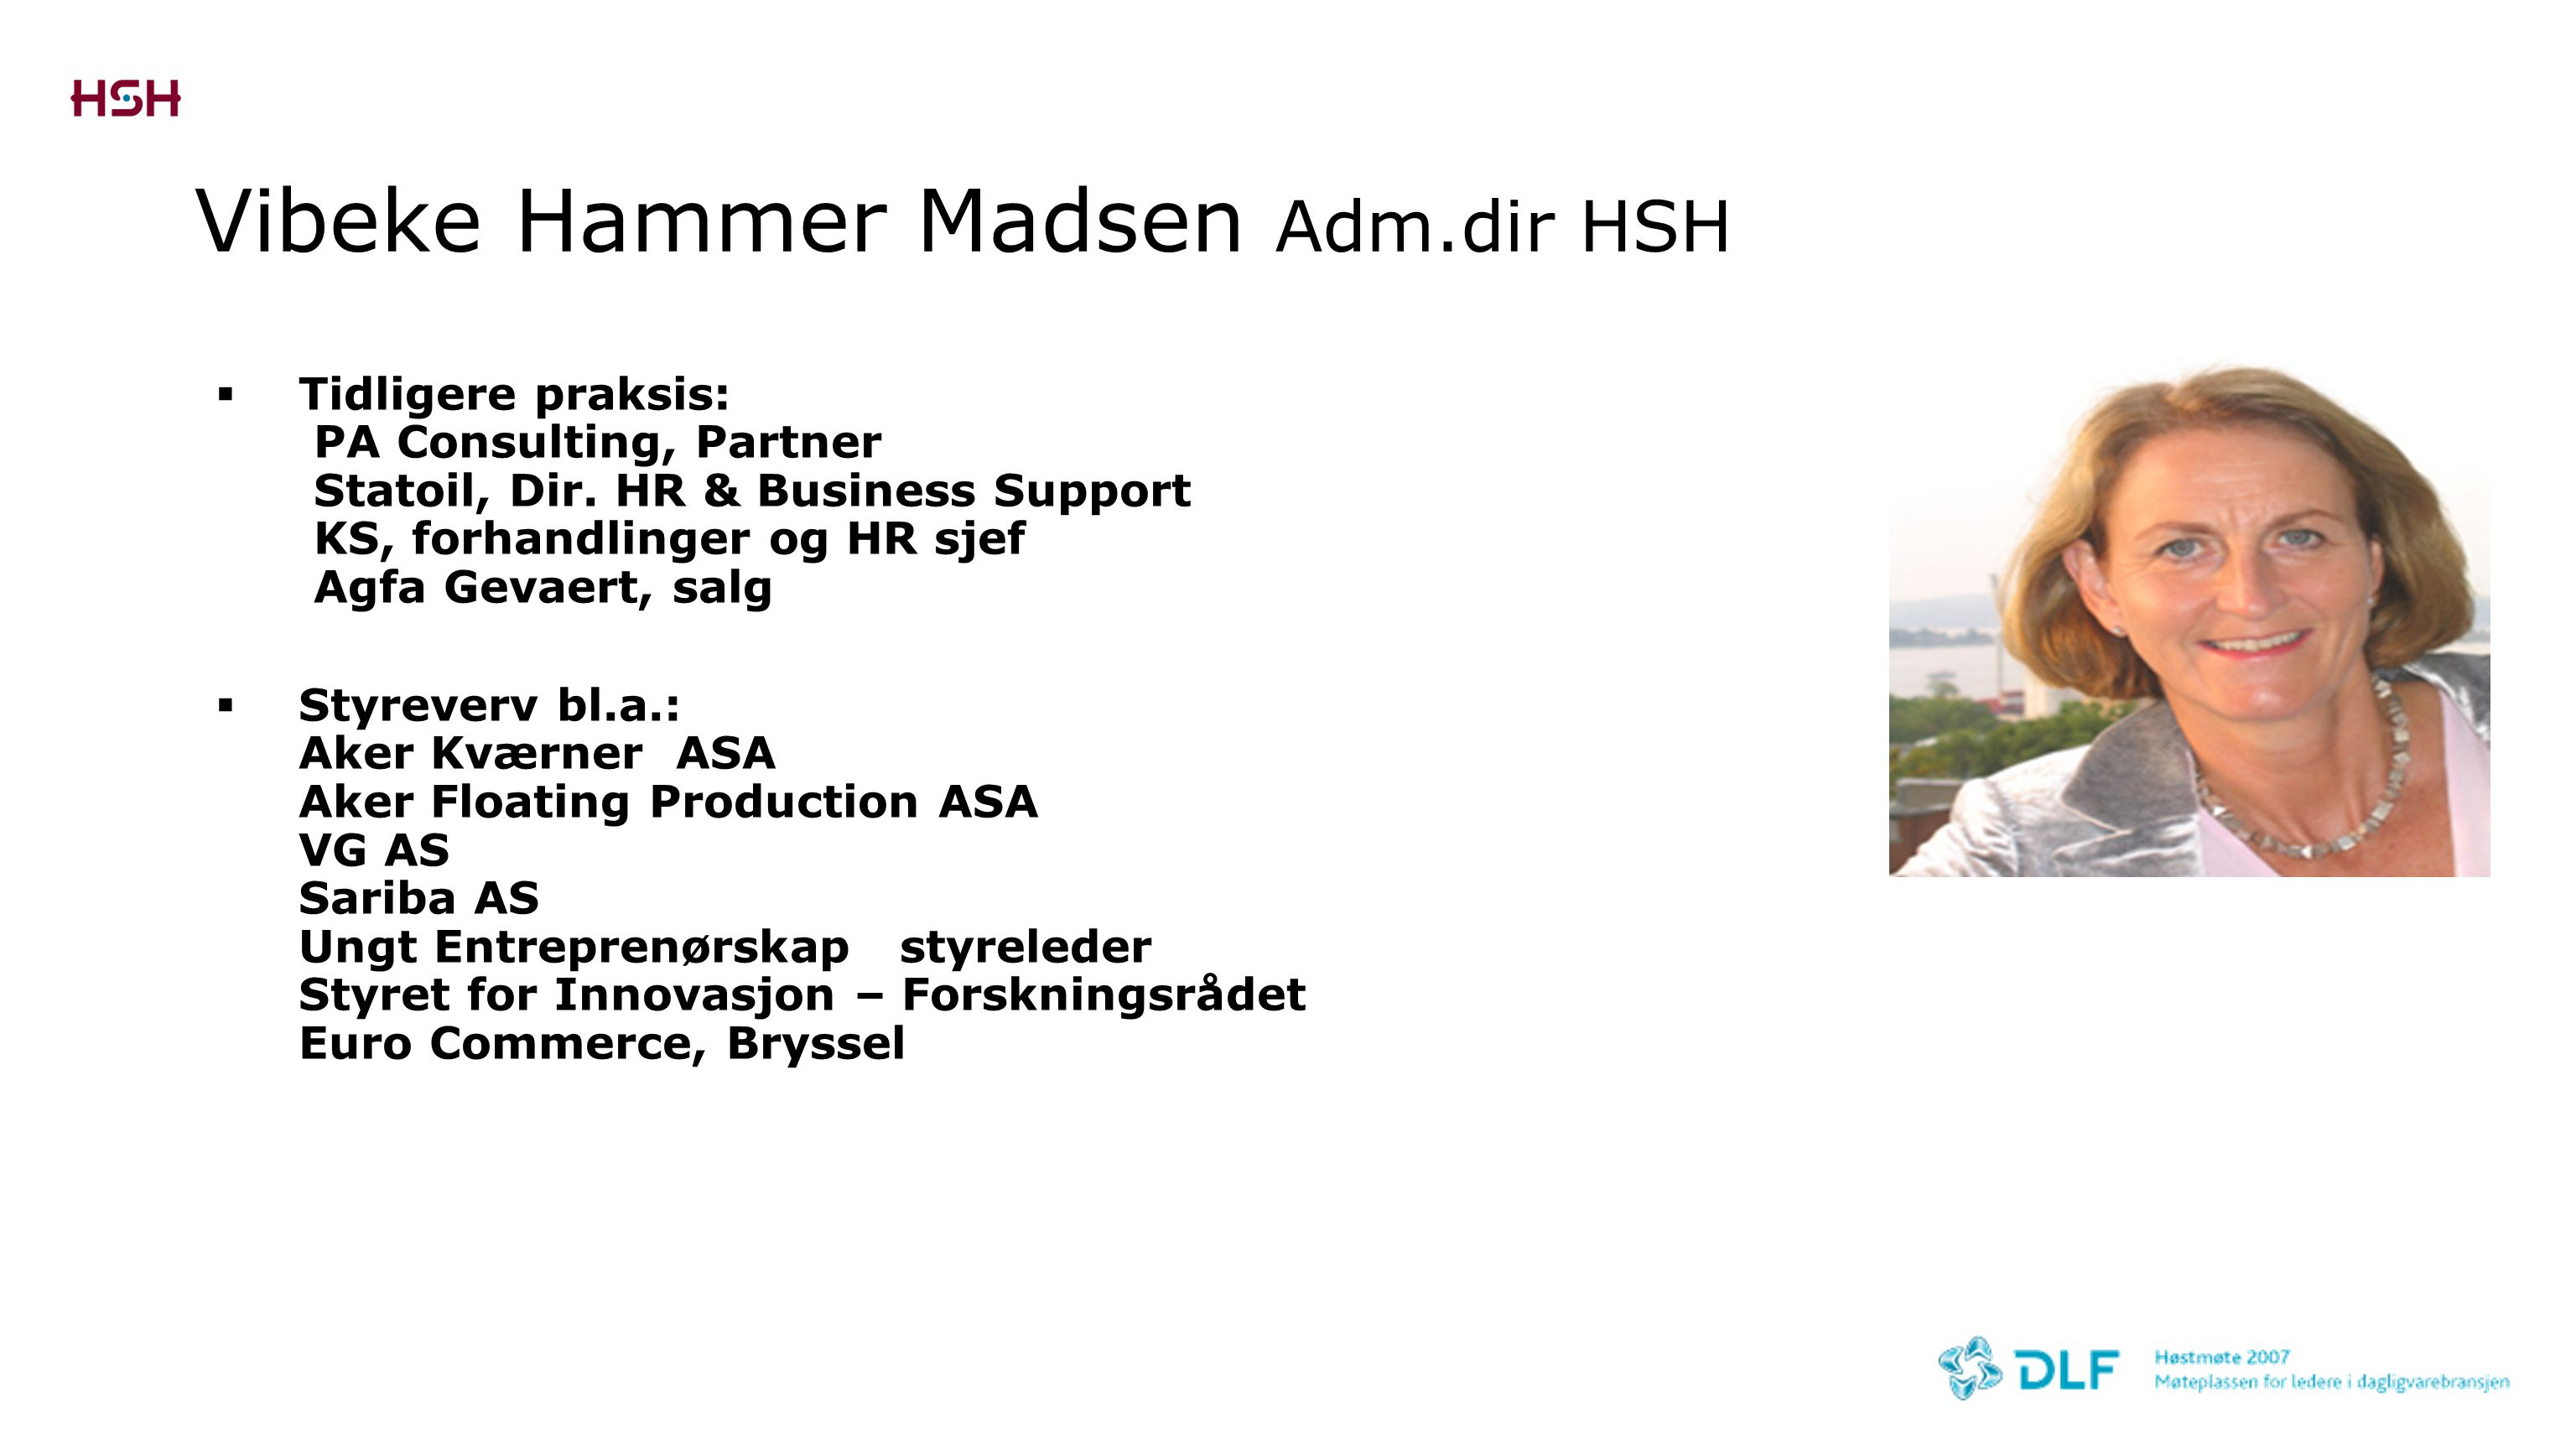 Vibeke Hammer Madsen Adm.dir HSH